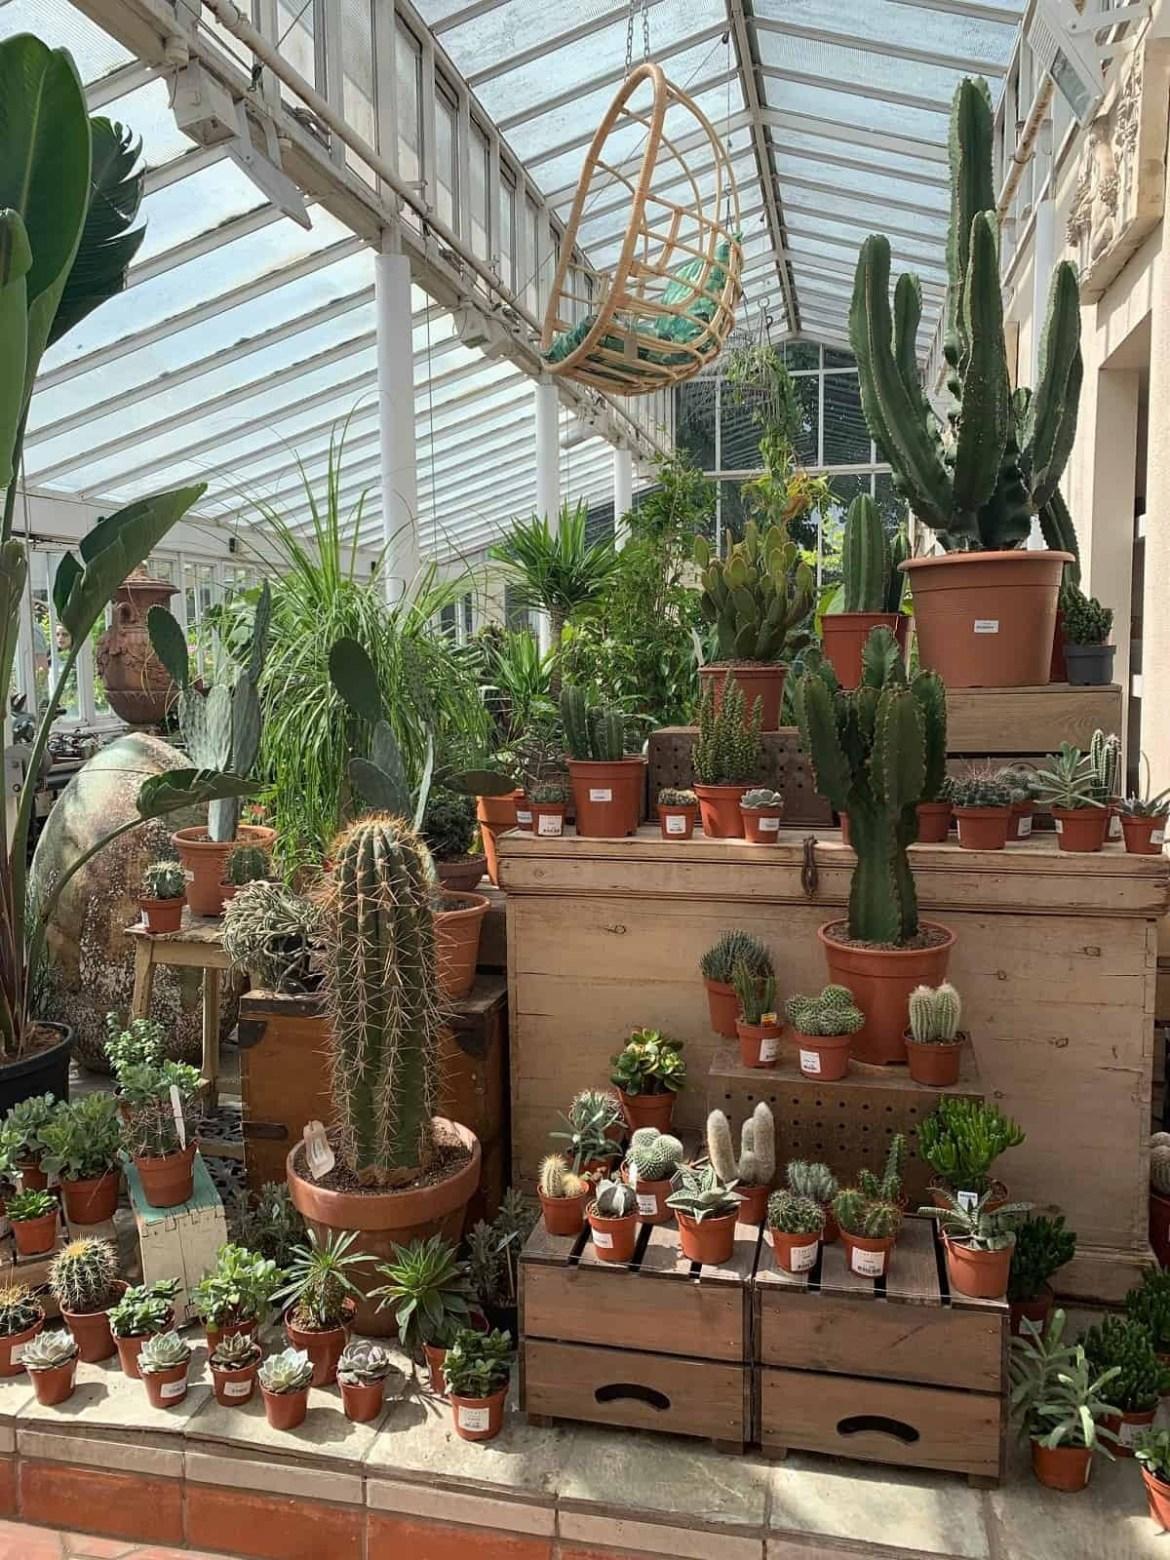 Clifton Nurseries in London